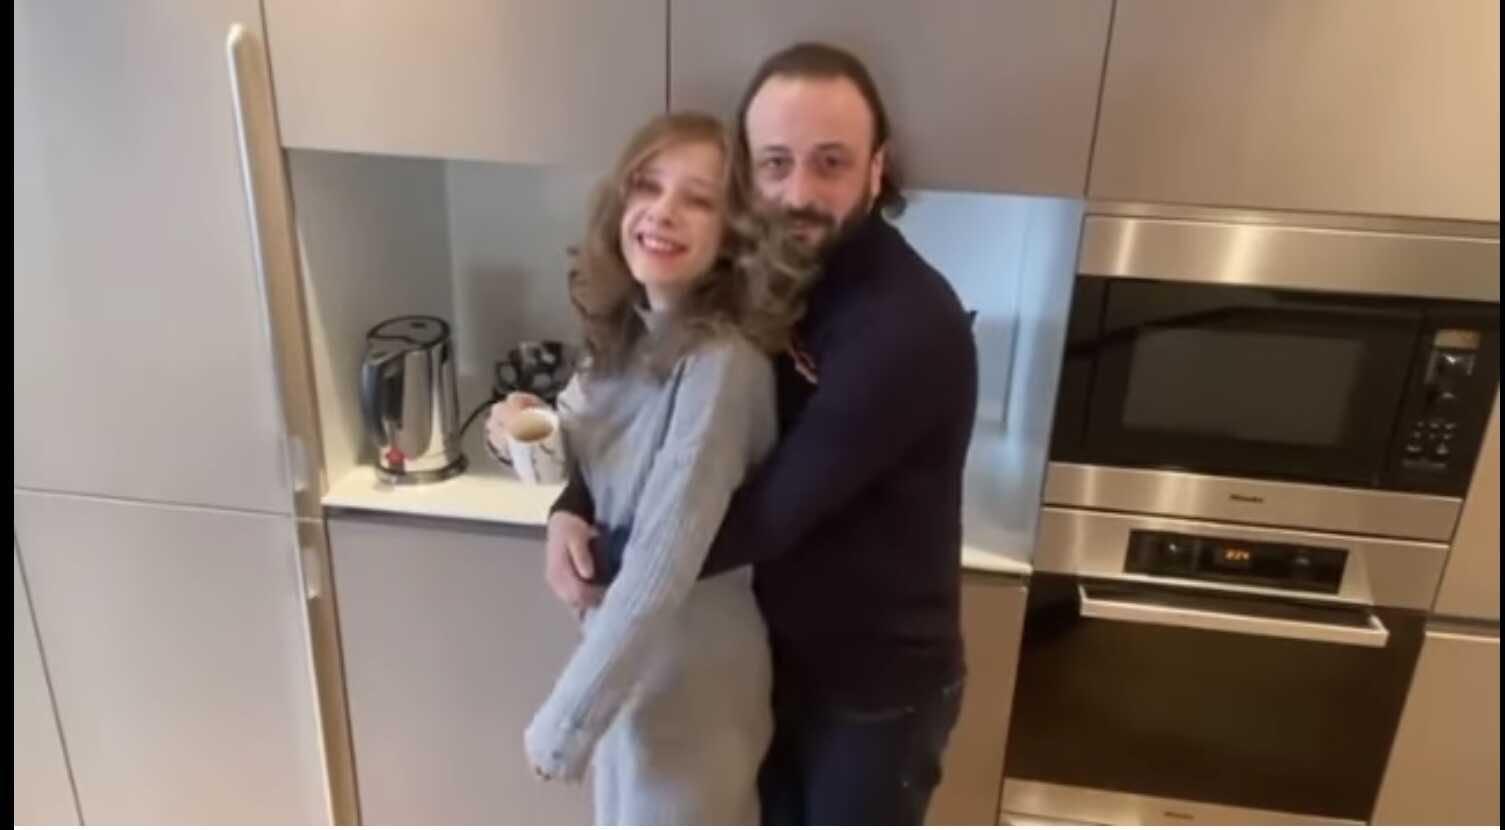 Liza Arzamasova is pregnant